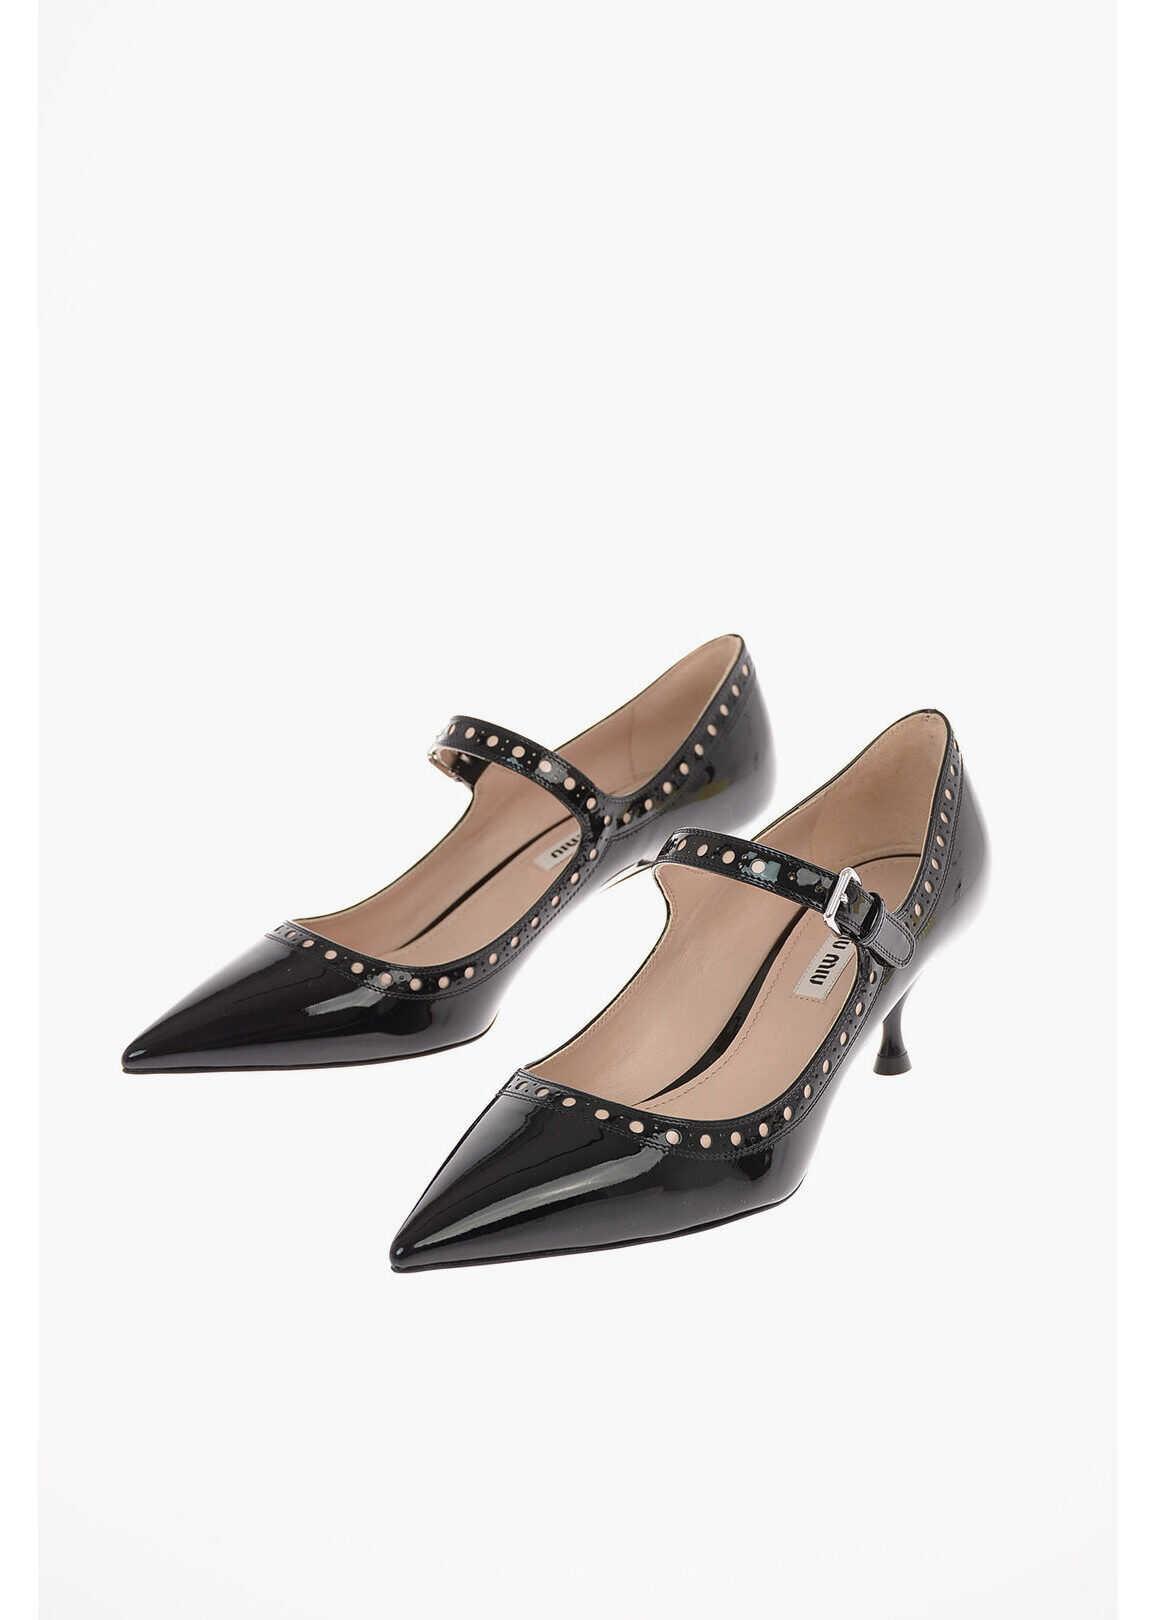 Miu Miu Lacquered Leather Kitten Heel Pumps 5cm BLACK imagine b-mall.ro